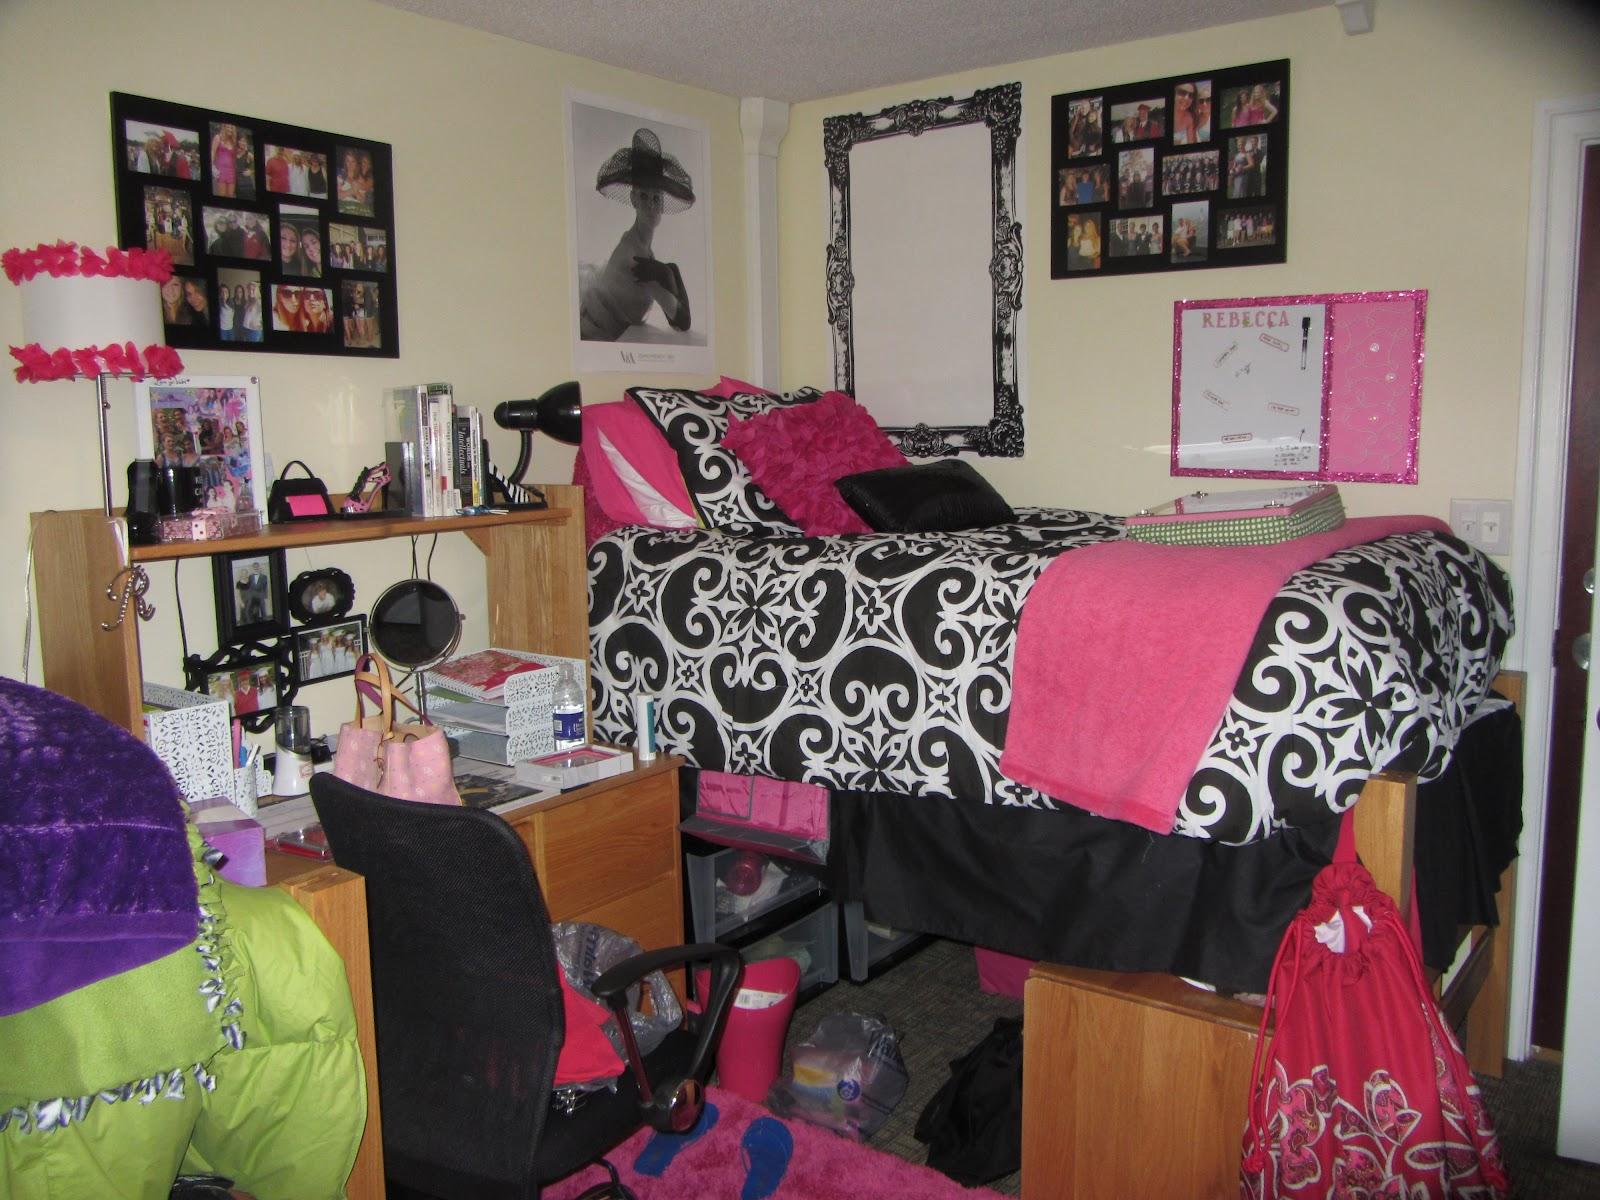 Chic Speaks: Dorm Room Decorating Ideas